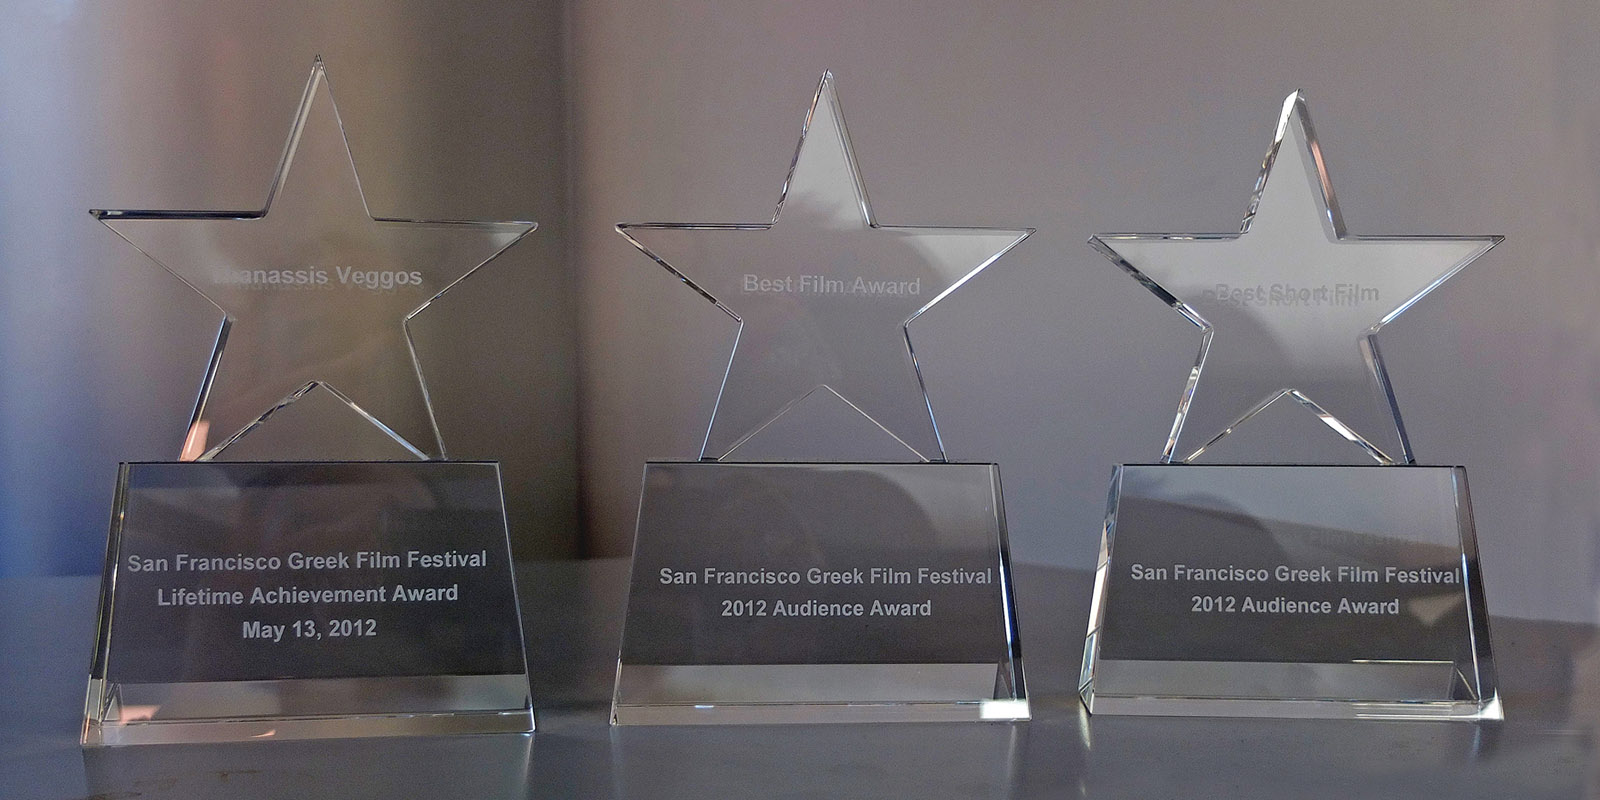 San Francisco Greek Film Festival Astron Award